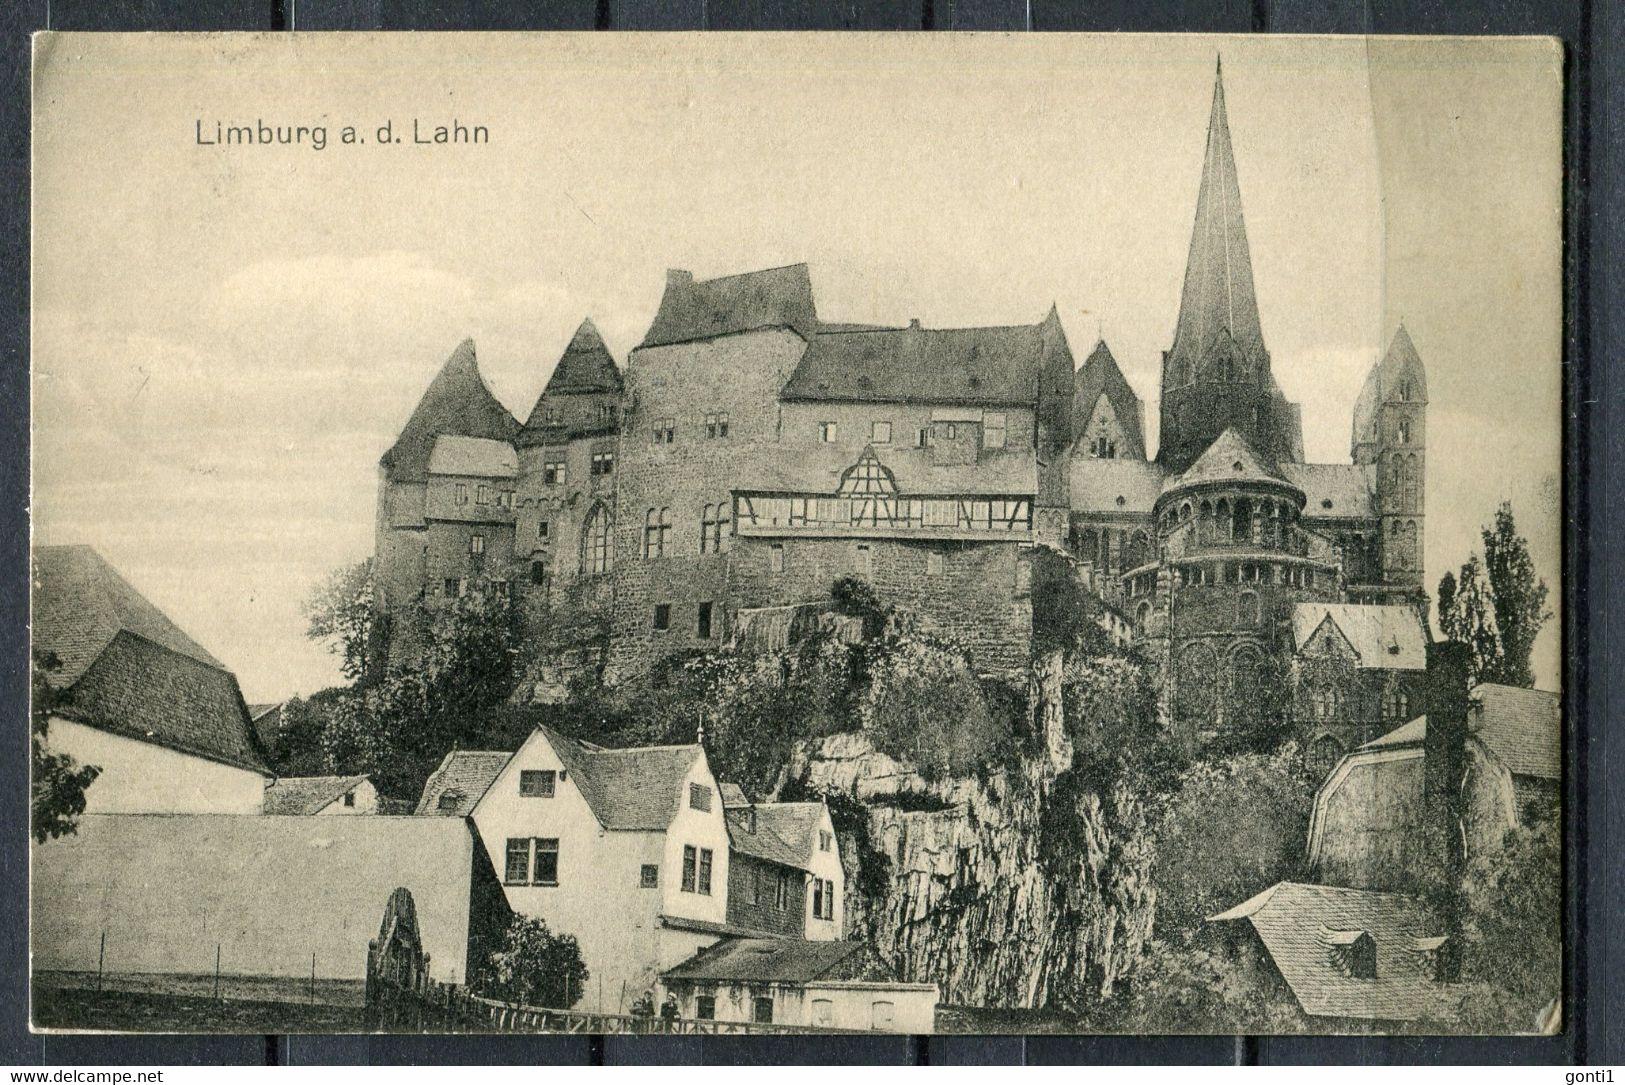 "CPS S/w AK German Empires,DR Limburg An Der Lahn 1916 Feldpost ""Limburg-Ortsblick"" 1 AK Used - Limburg"